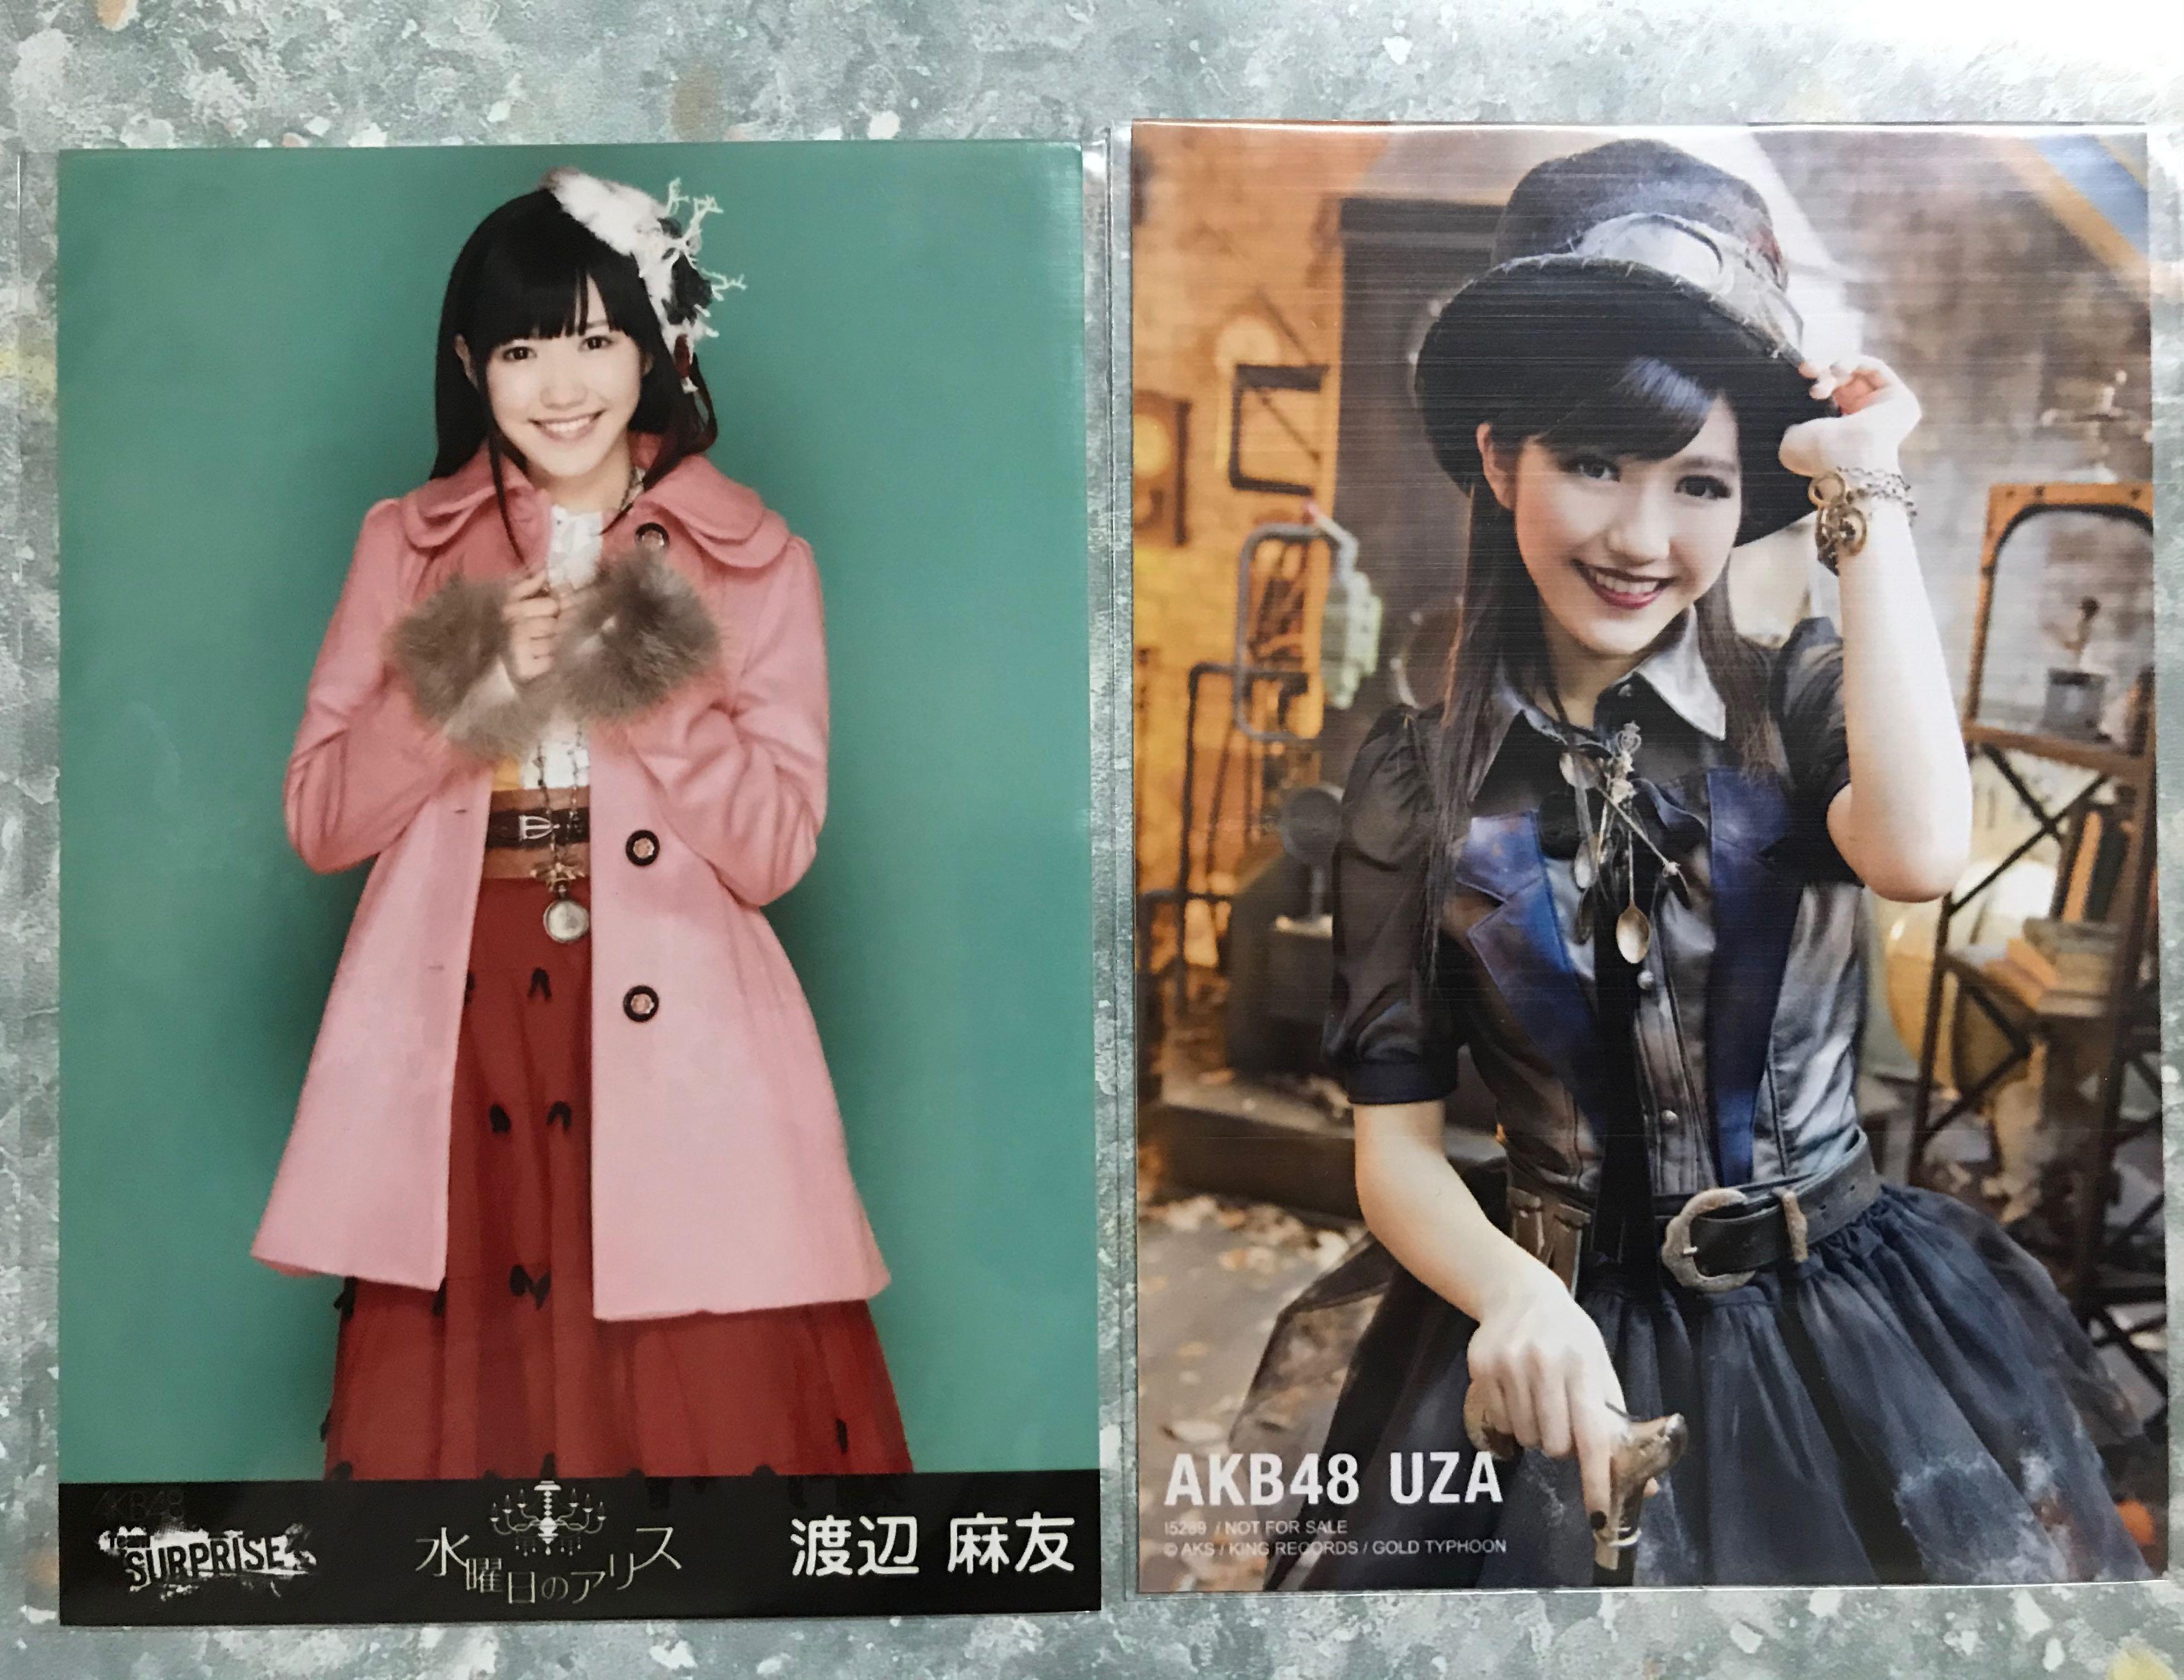 AKB48渡邊麻友生寫